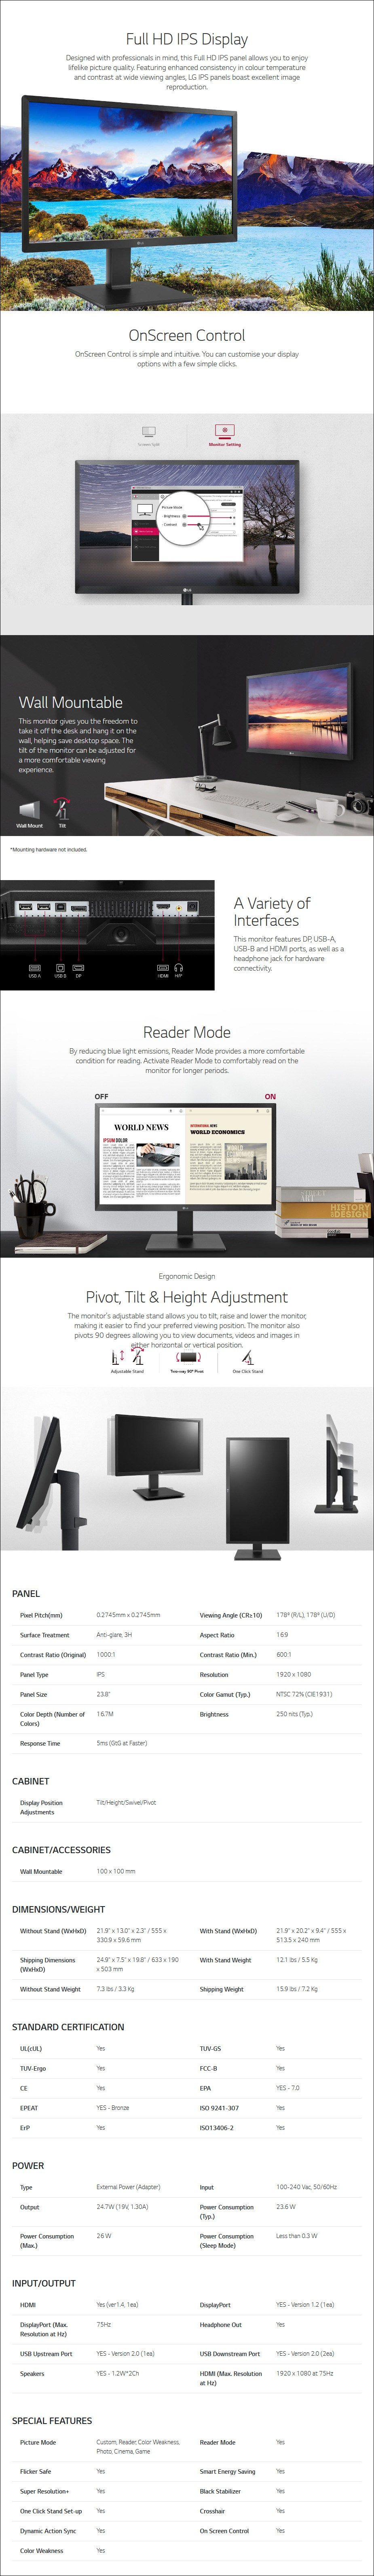 "Samsung 24BL450Y-B 23.8"" 75Hz Full HD Ergonomic IPS Monitor - Overview 1"